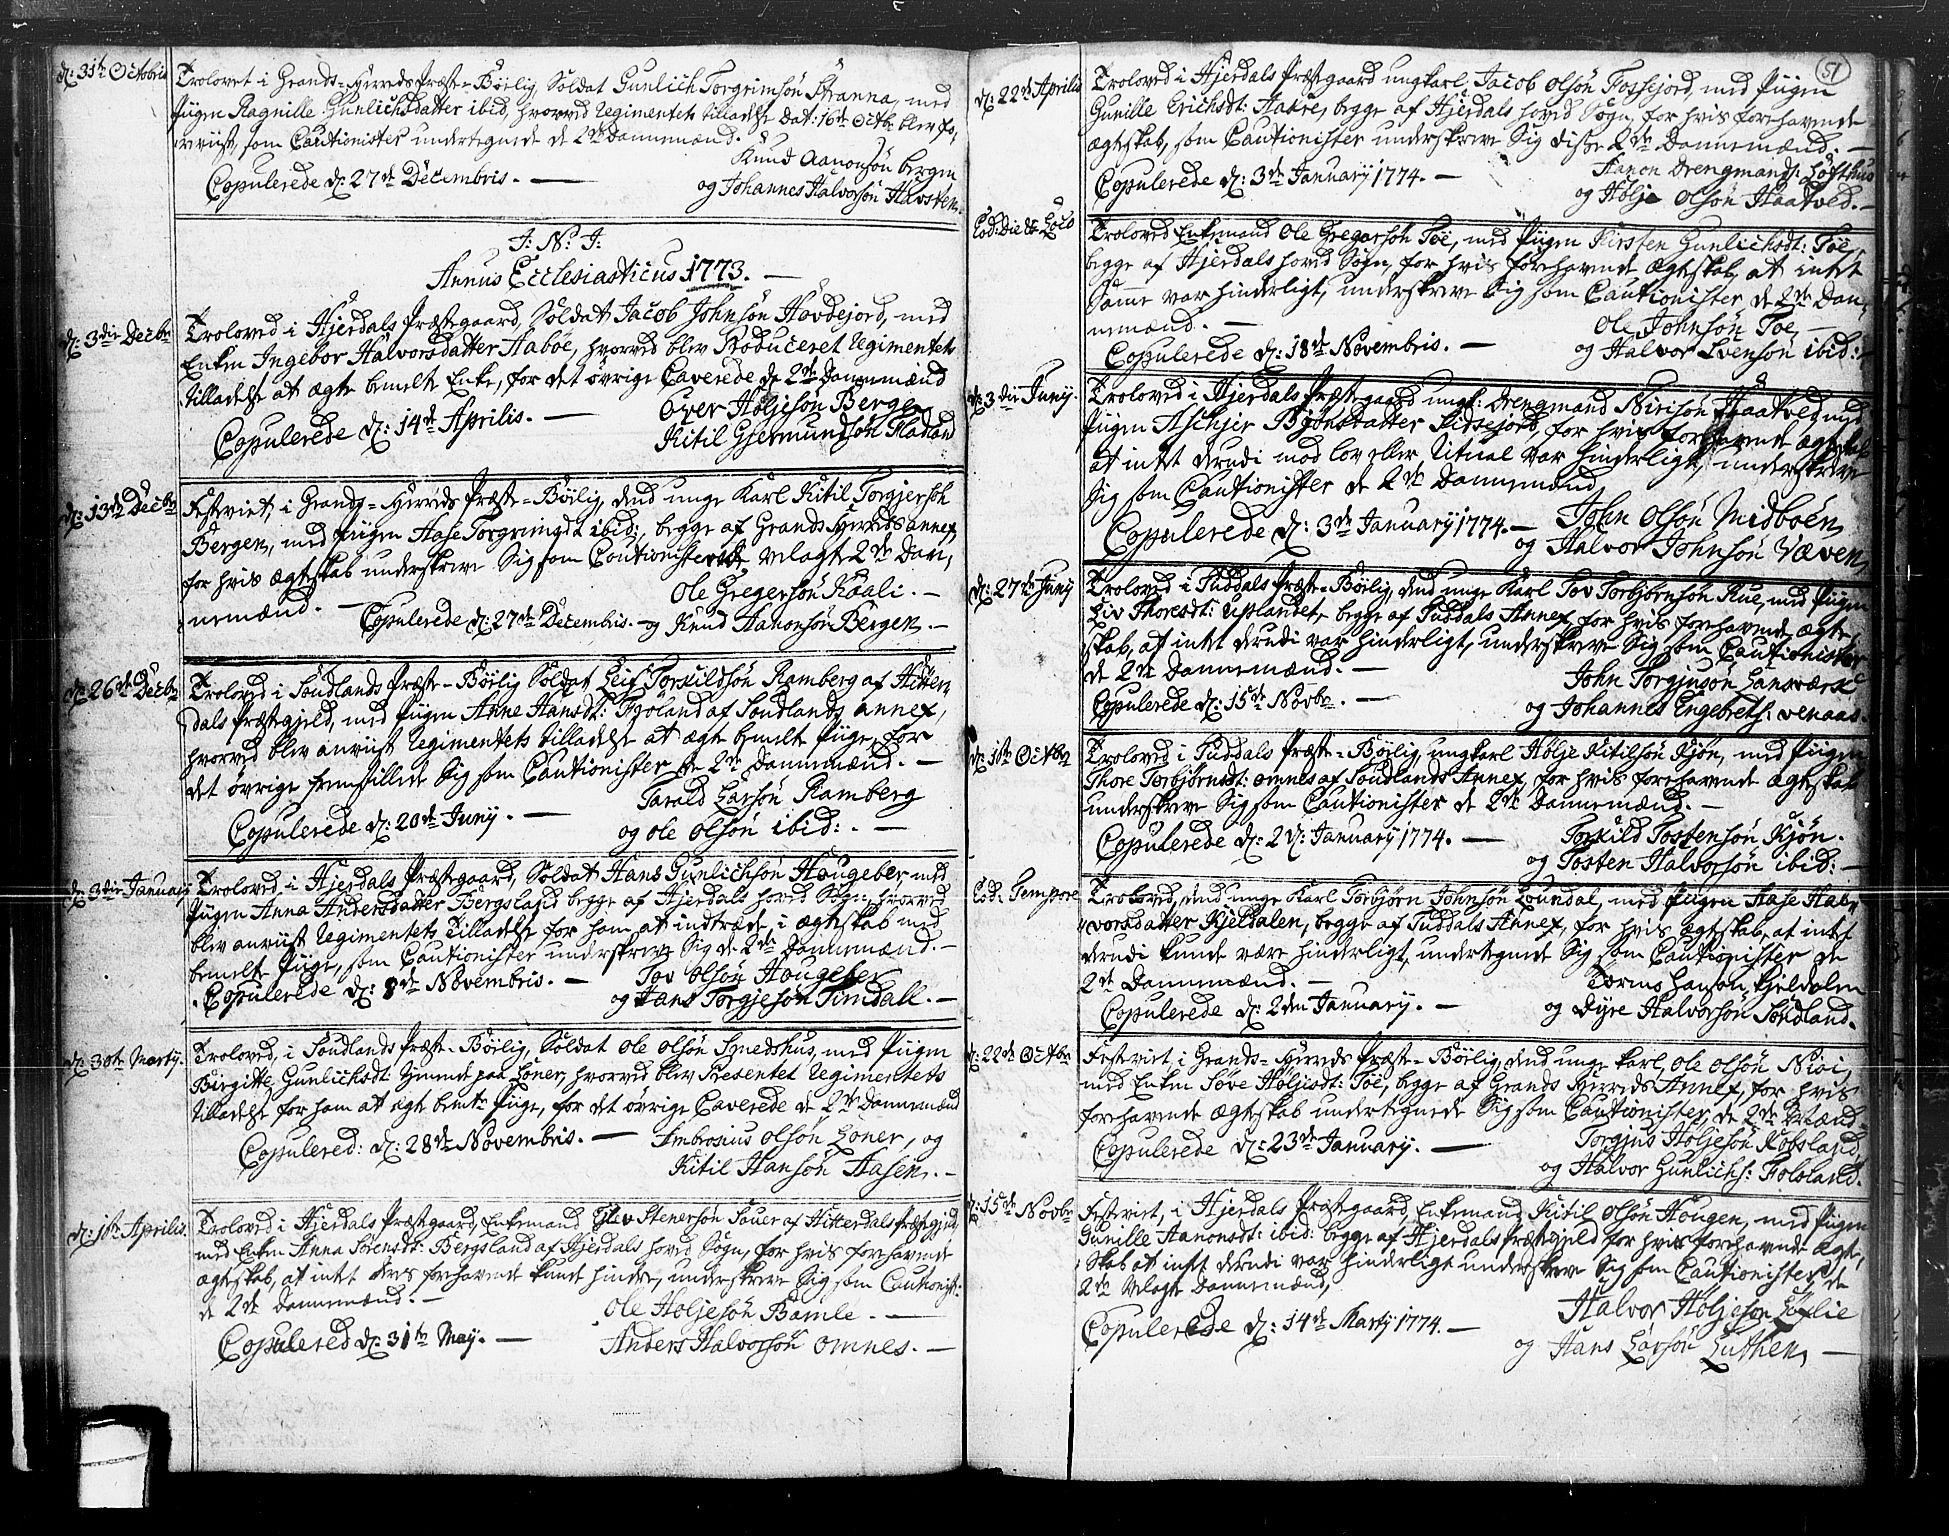 SAKO, Hjartdal kirkebøker, F/Fa/L0004: Ministerialbok nr. I 4, 1727-1795, s. 51